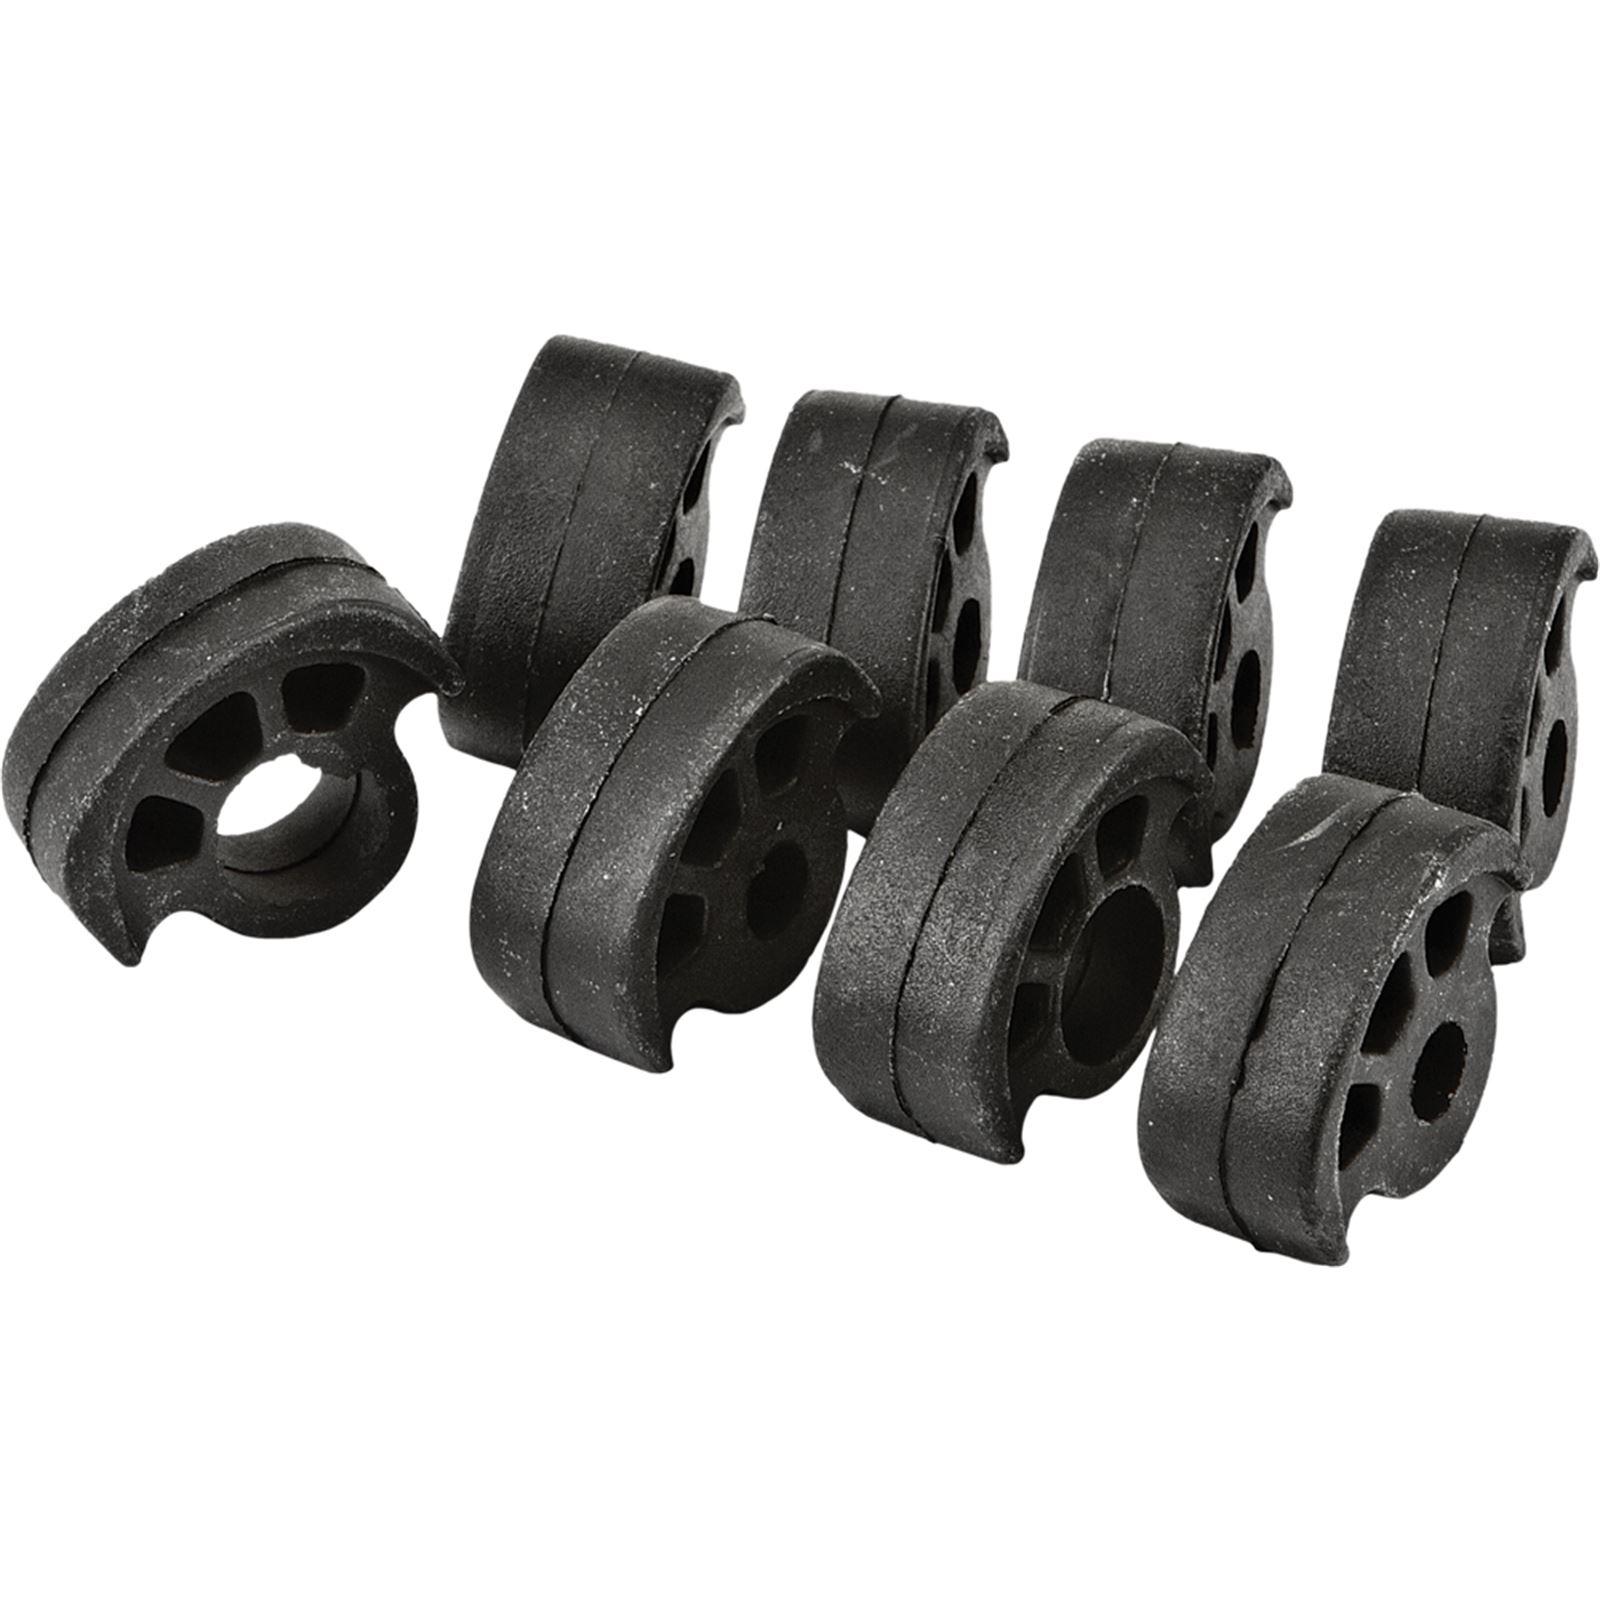 Harddrive Comfort-Ride Footpeg Rubber Inserts